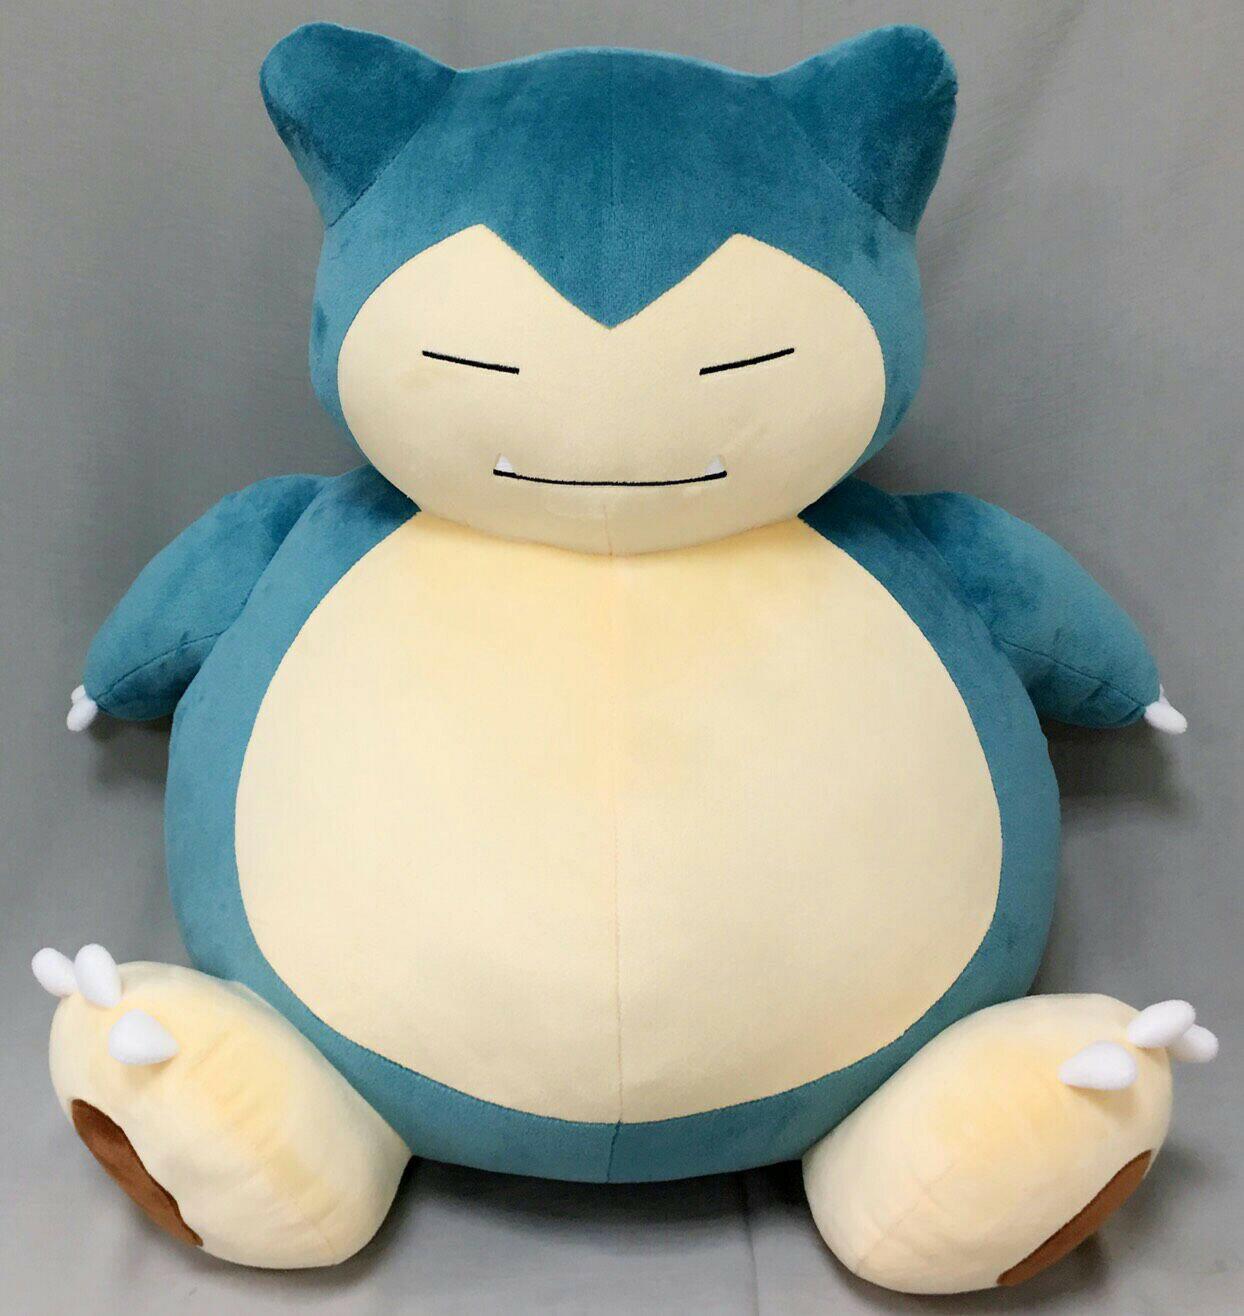 "Pokemon Go 12""卡比獸 公仔 毛絨 玩具 玩偶 靠墊 抱枕 生日禮物(30cm)"